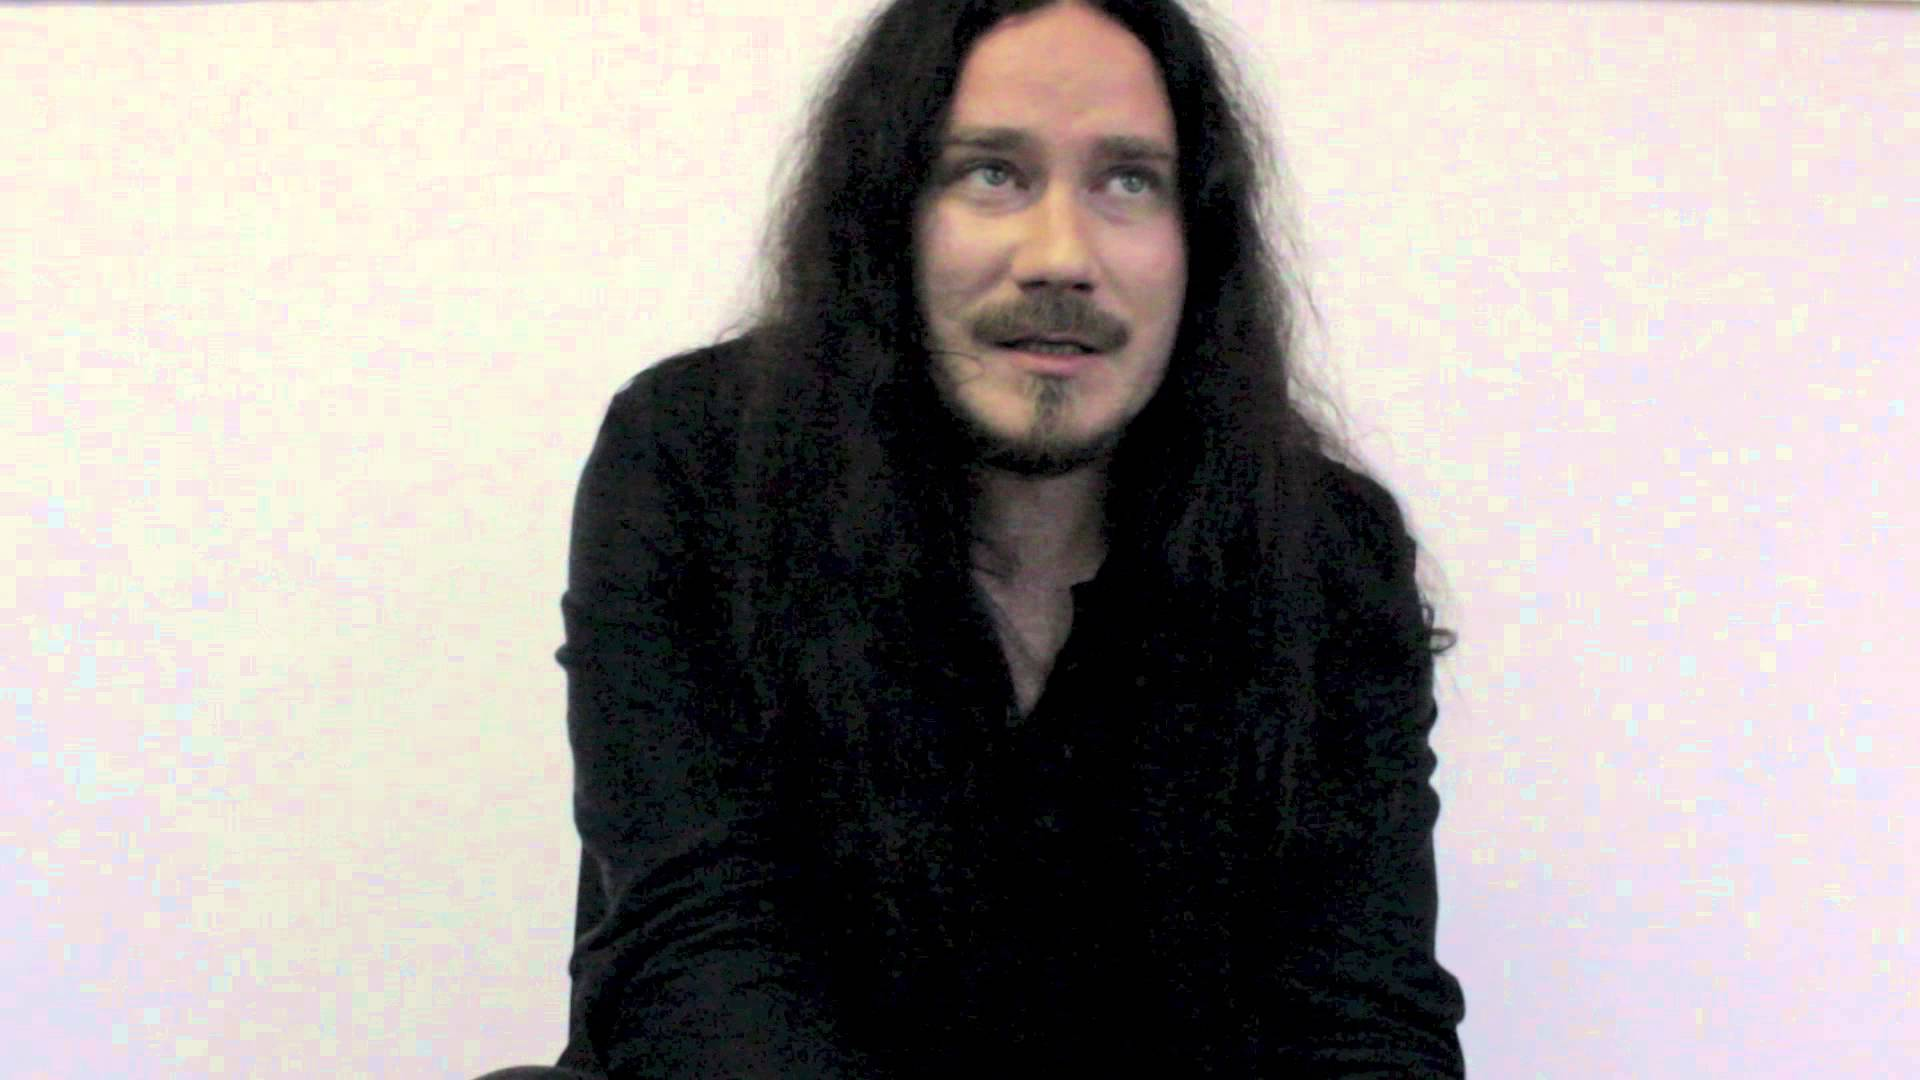 NIGHTWISH - Tuomas Holopainen on his Top Three Musical Influences